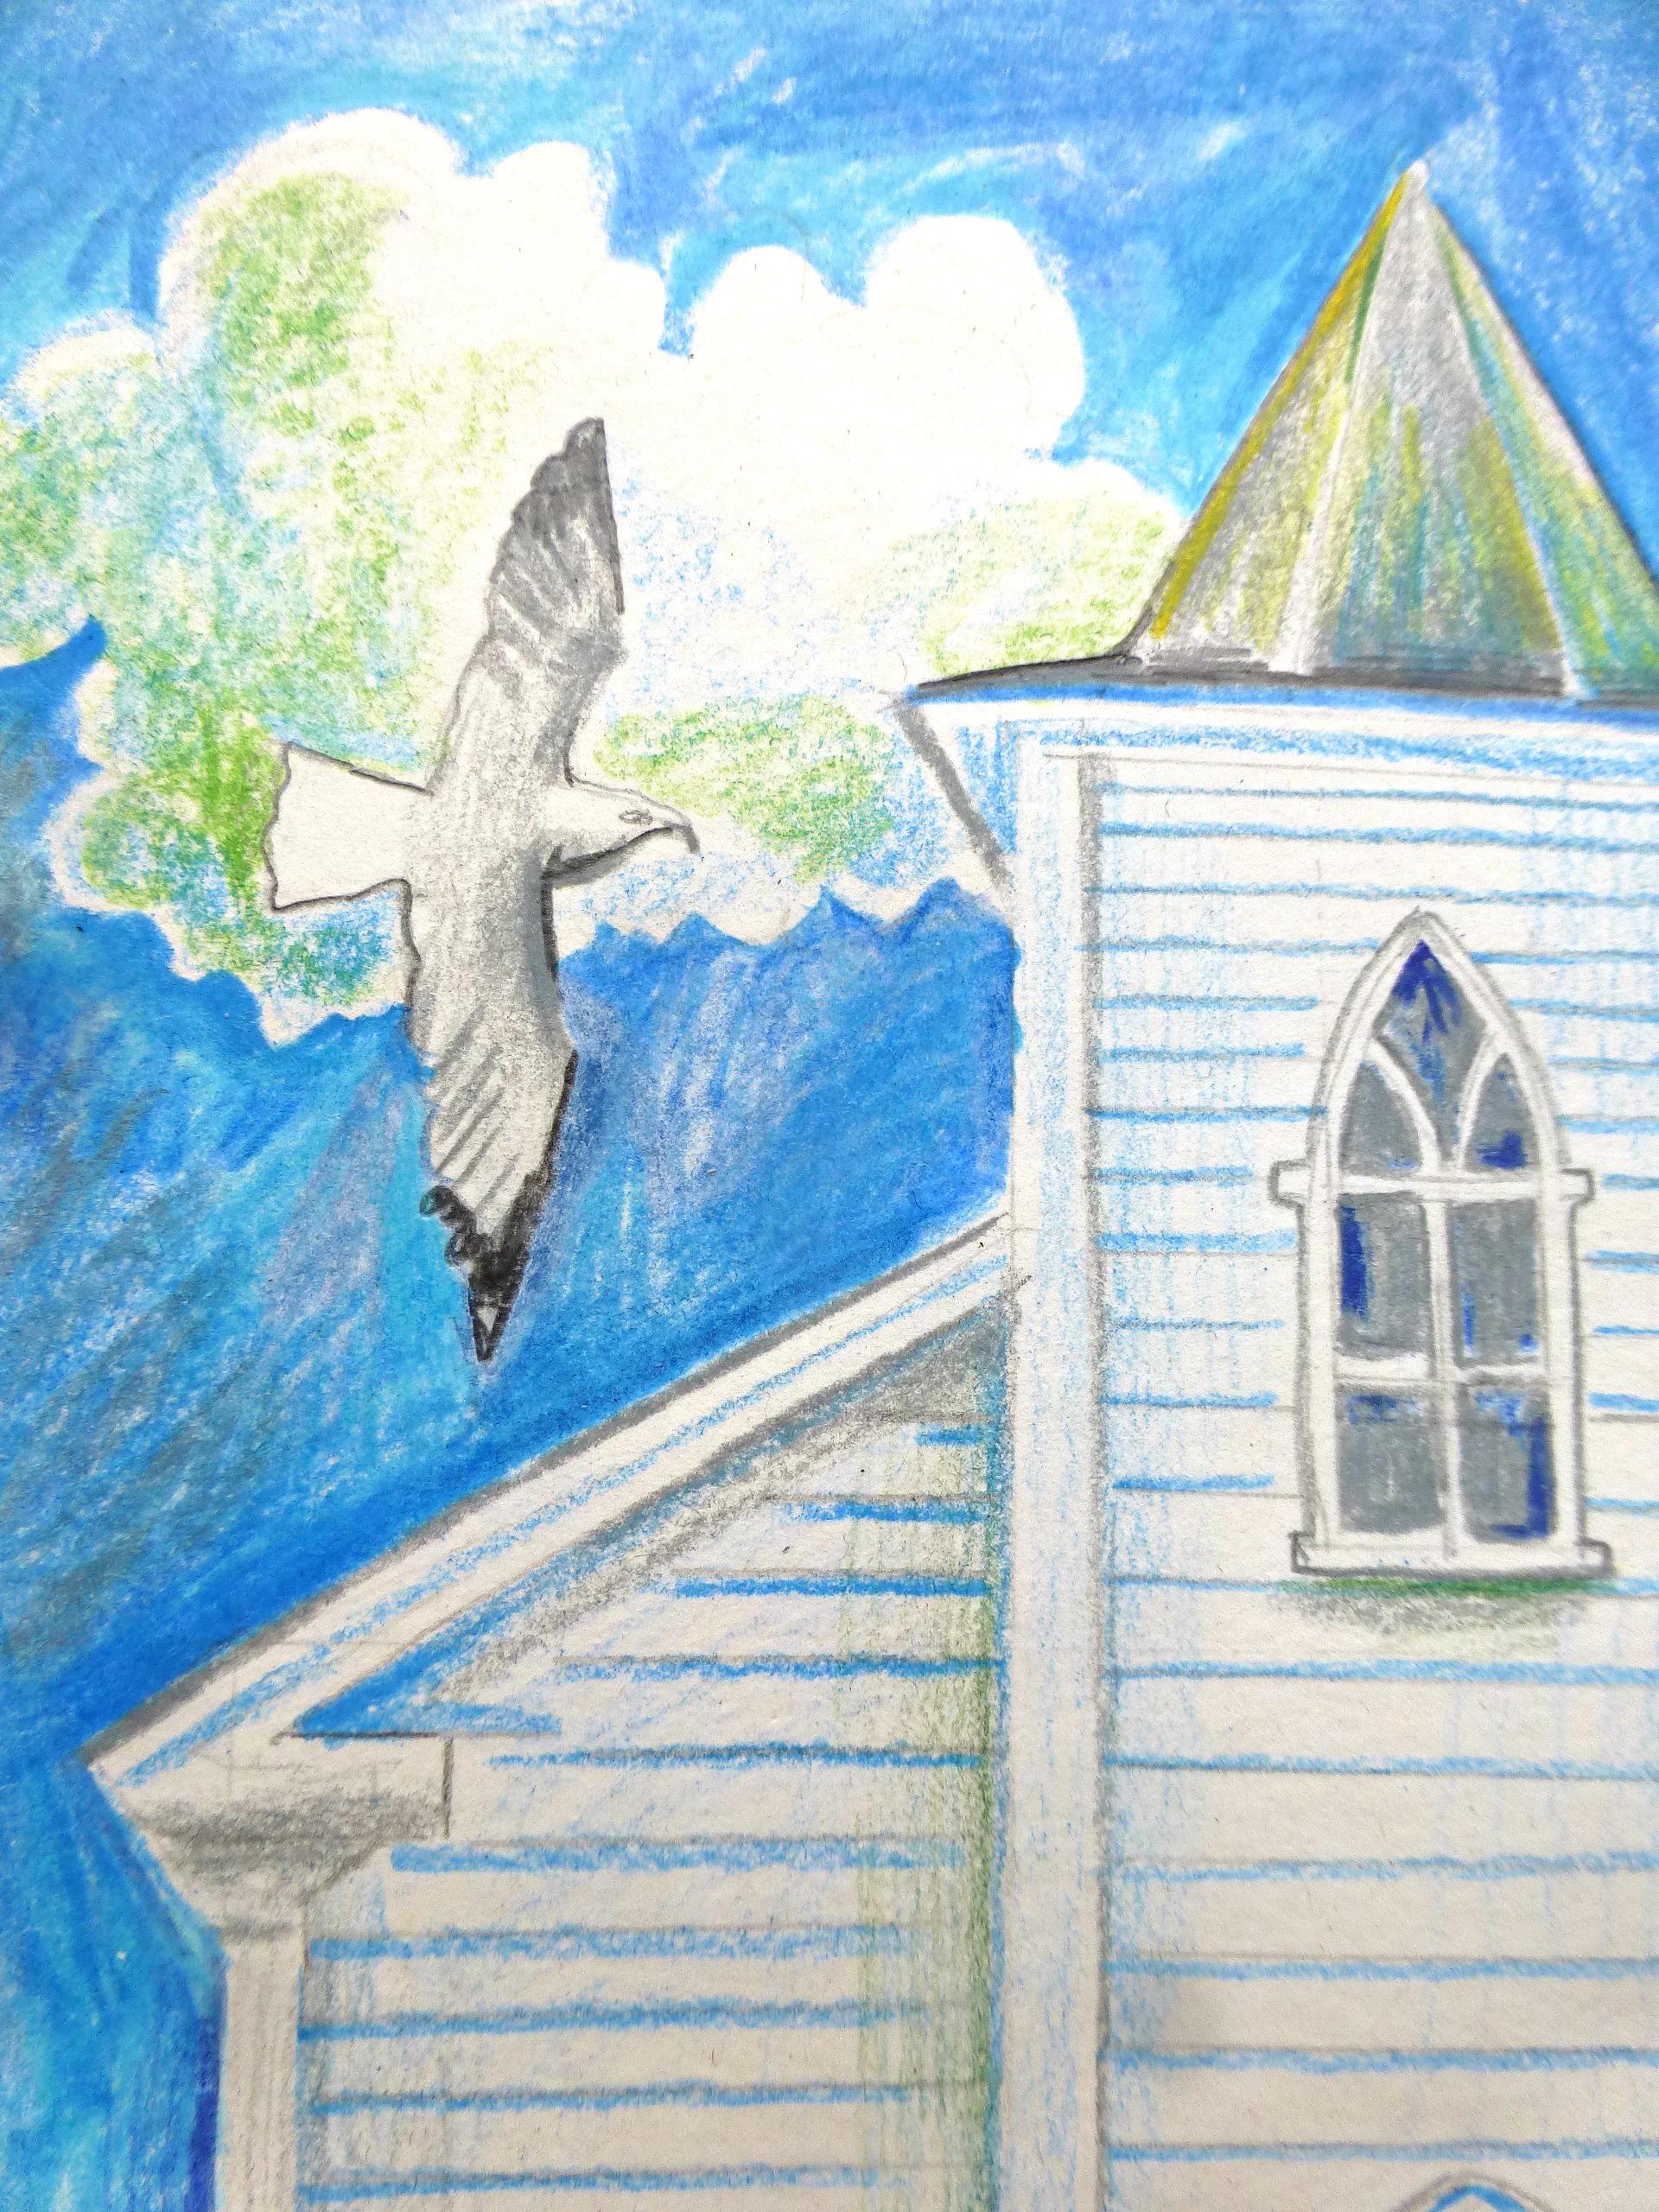 NOVA Goat Island Church colored pencil drawing detail 2